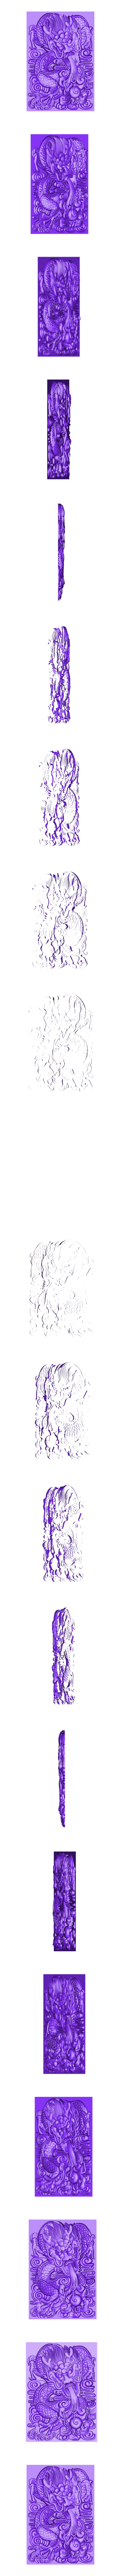 dragan.stl Download free STL file Dragon • 3D printable model, stlfilesfree